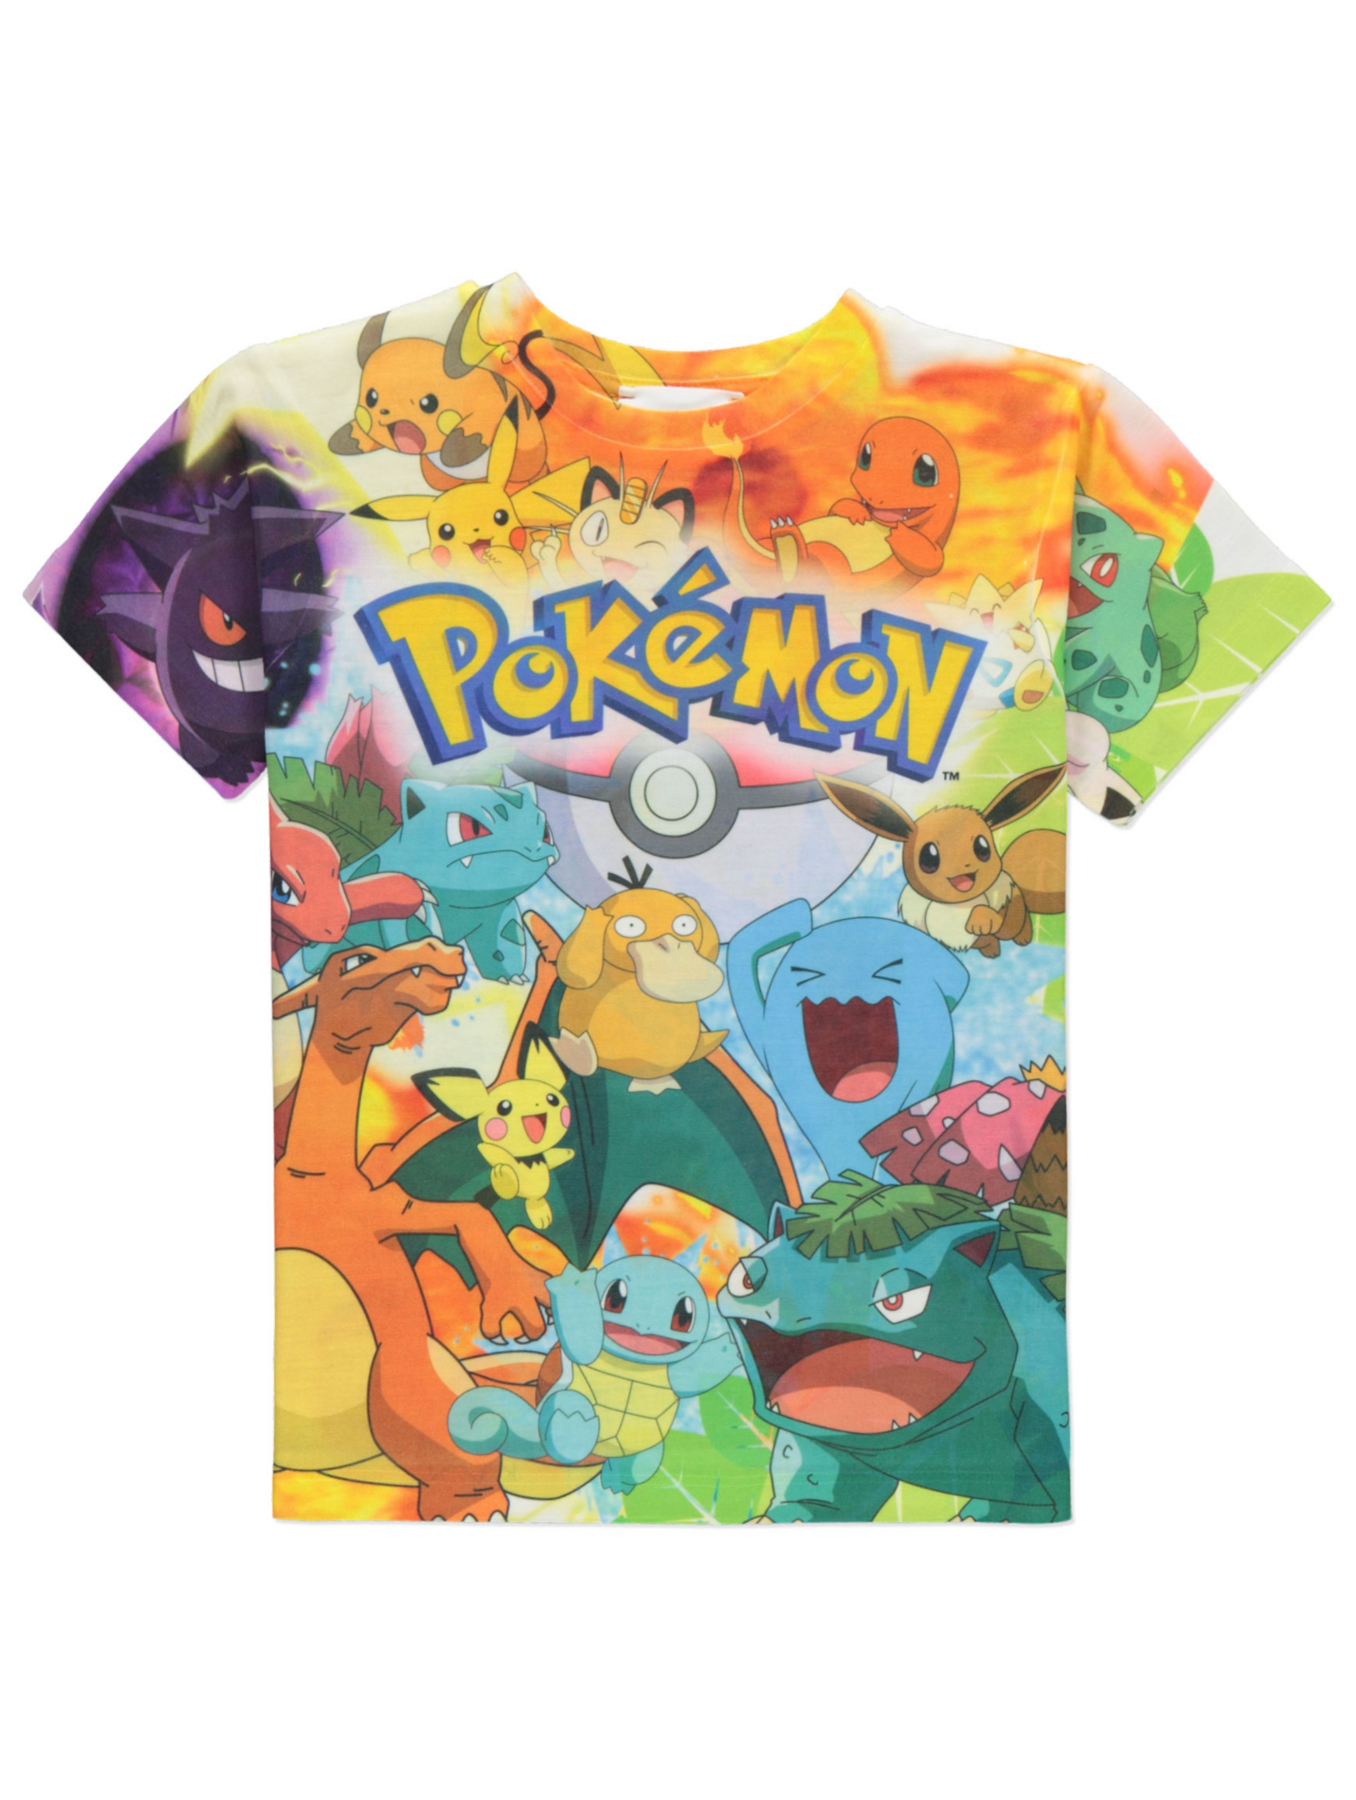 Pokémon T shirt Kids